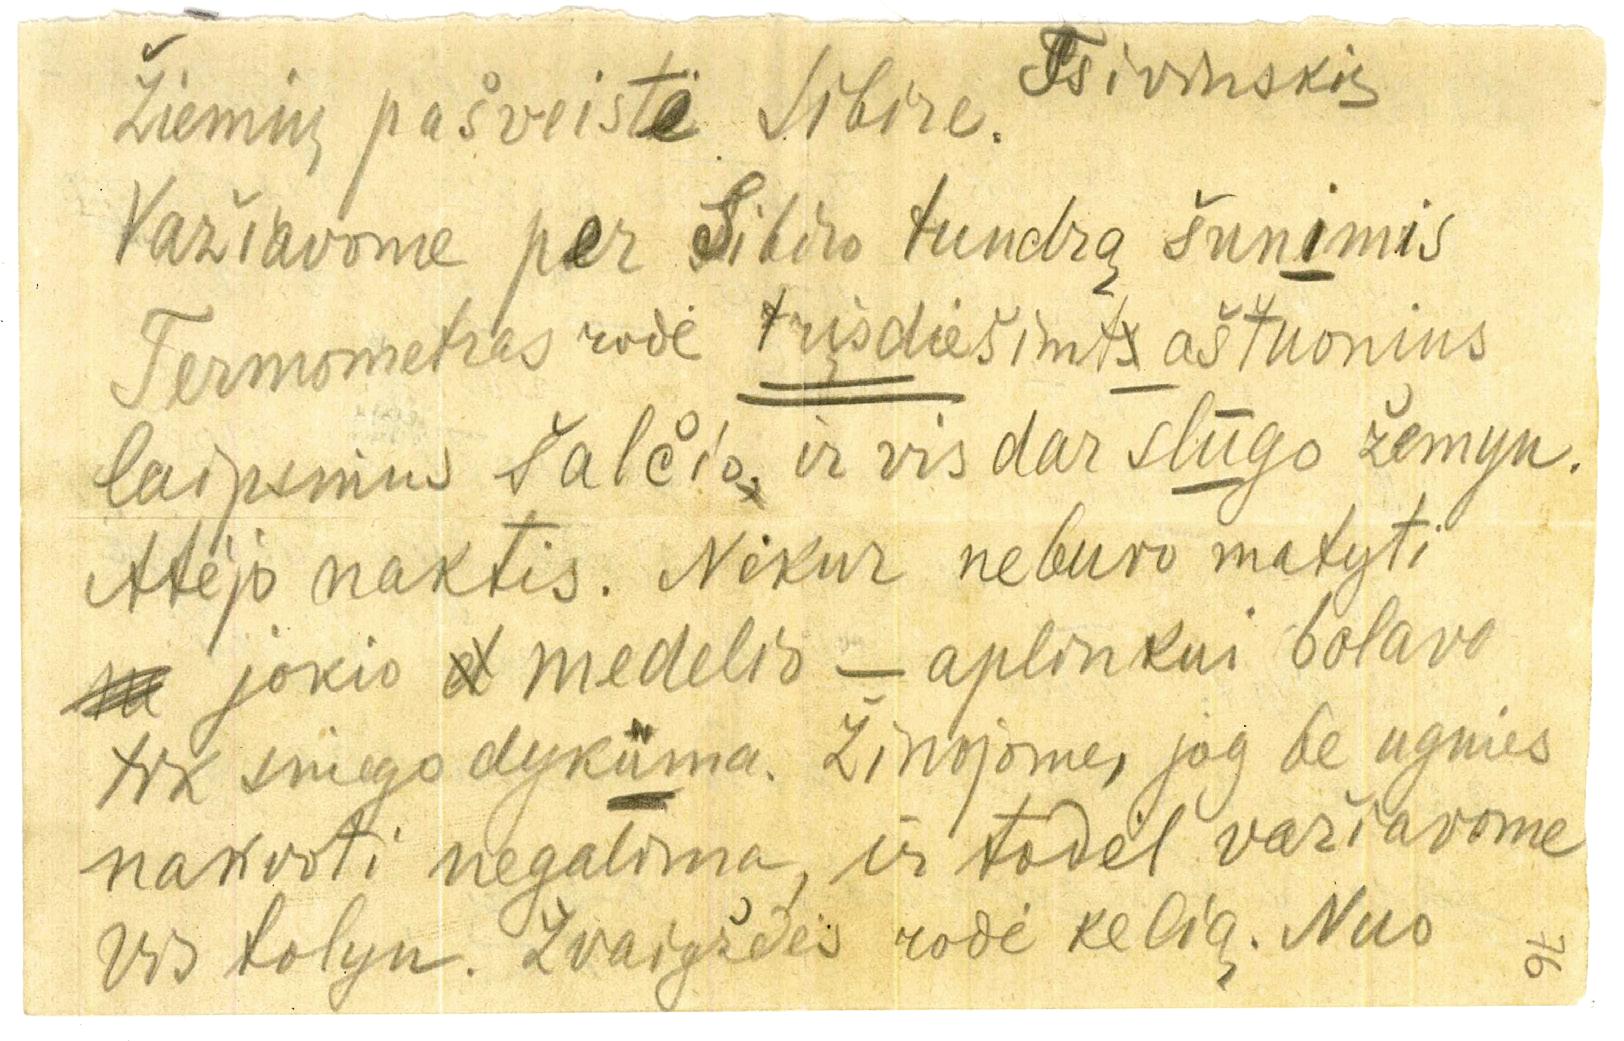 Pav. 2. V. Civinskio Tartu rašyto diktanto fragmentas su ištaisymais (F1-D1045, 63v)